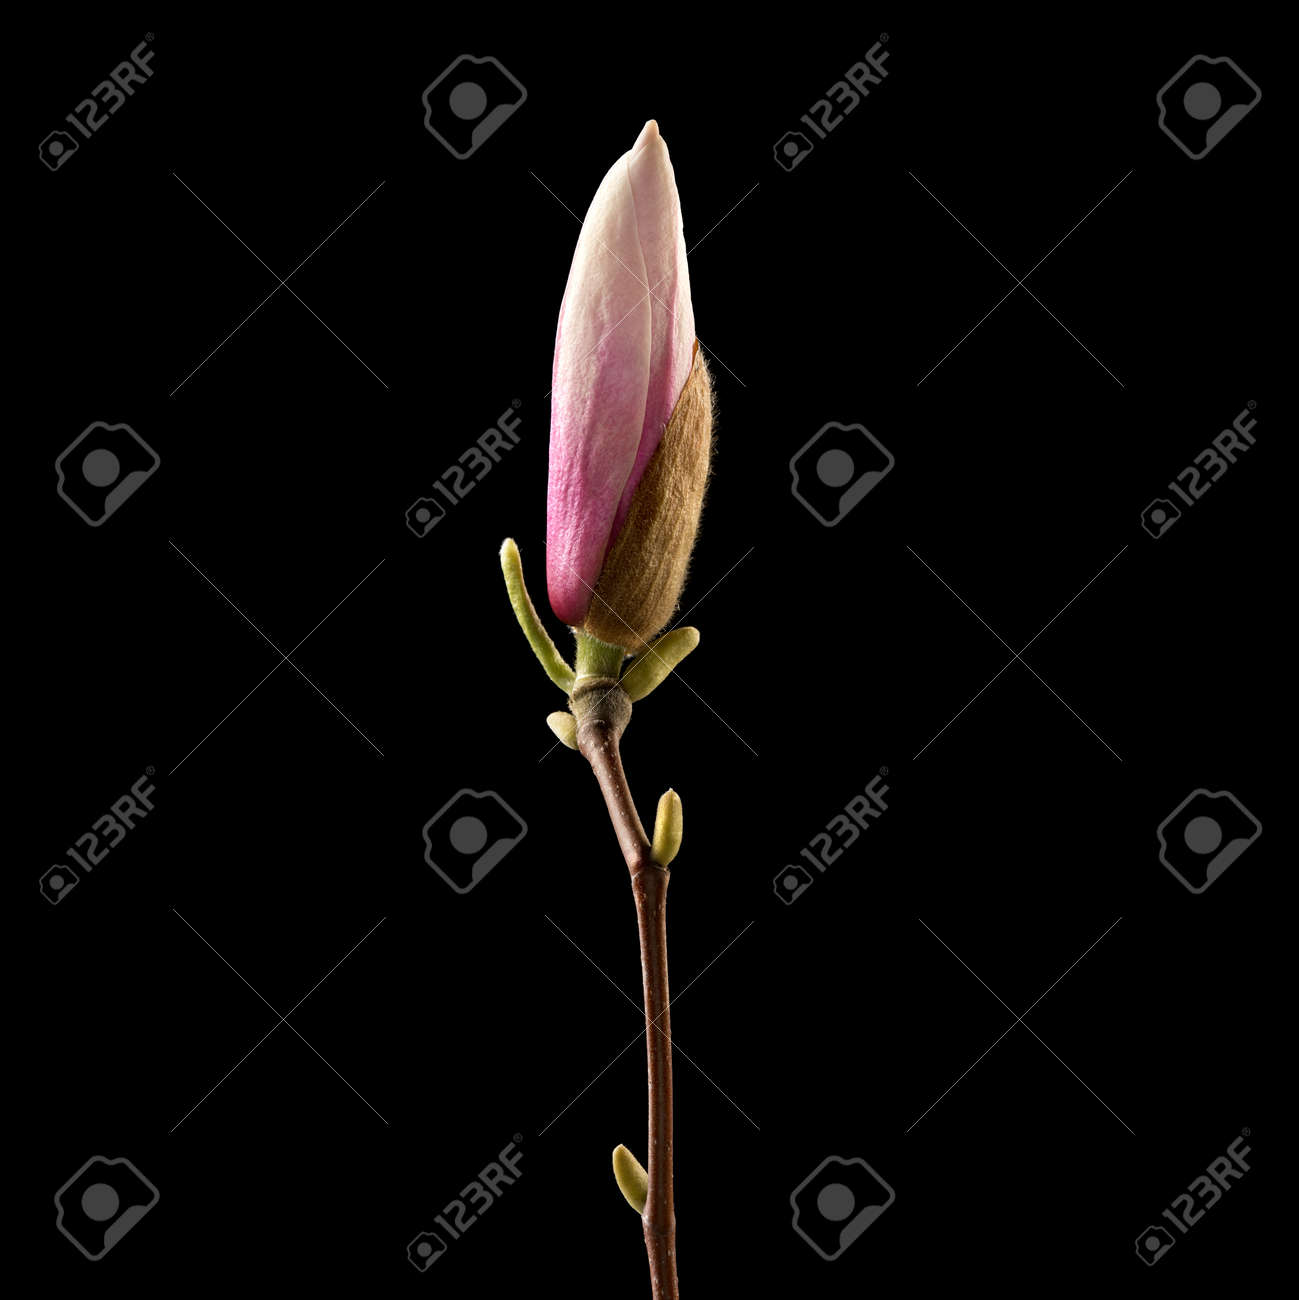 Magnolia Flower On Black Background Macro Nature High Resolution